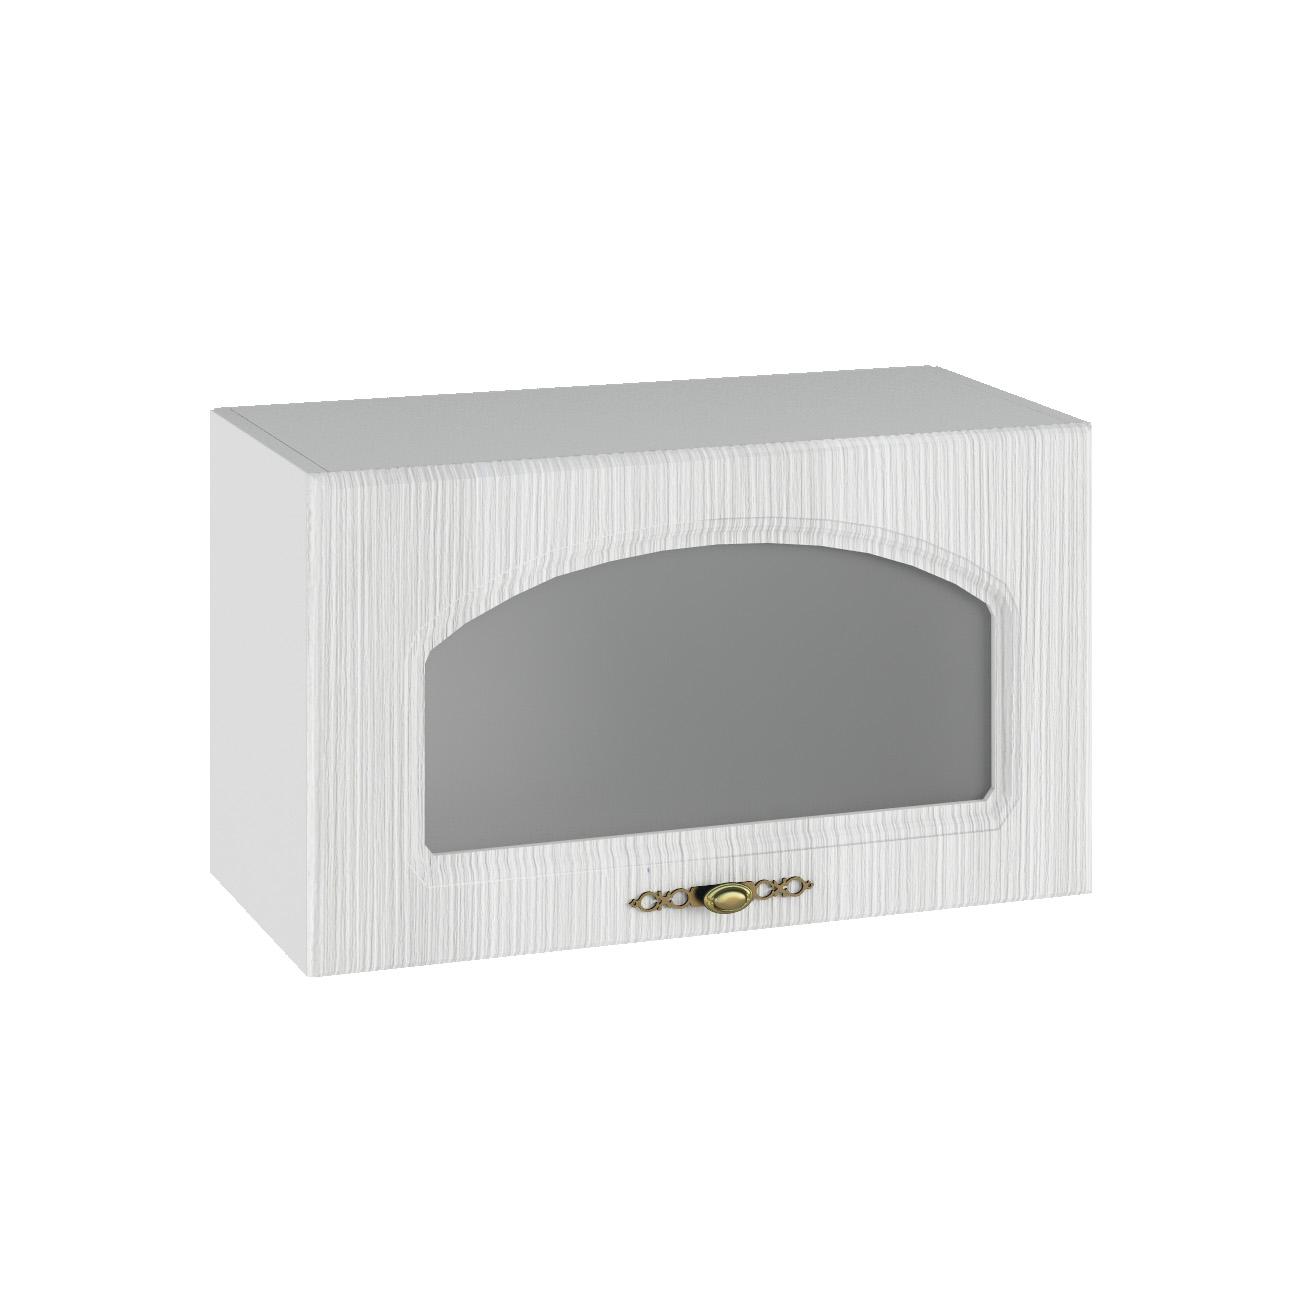 Кухня Монако ГПГС 600 Шкаф верхний глубина 574